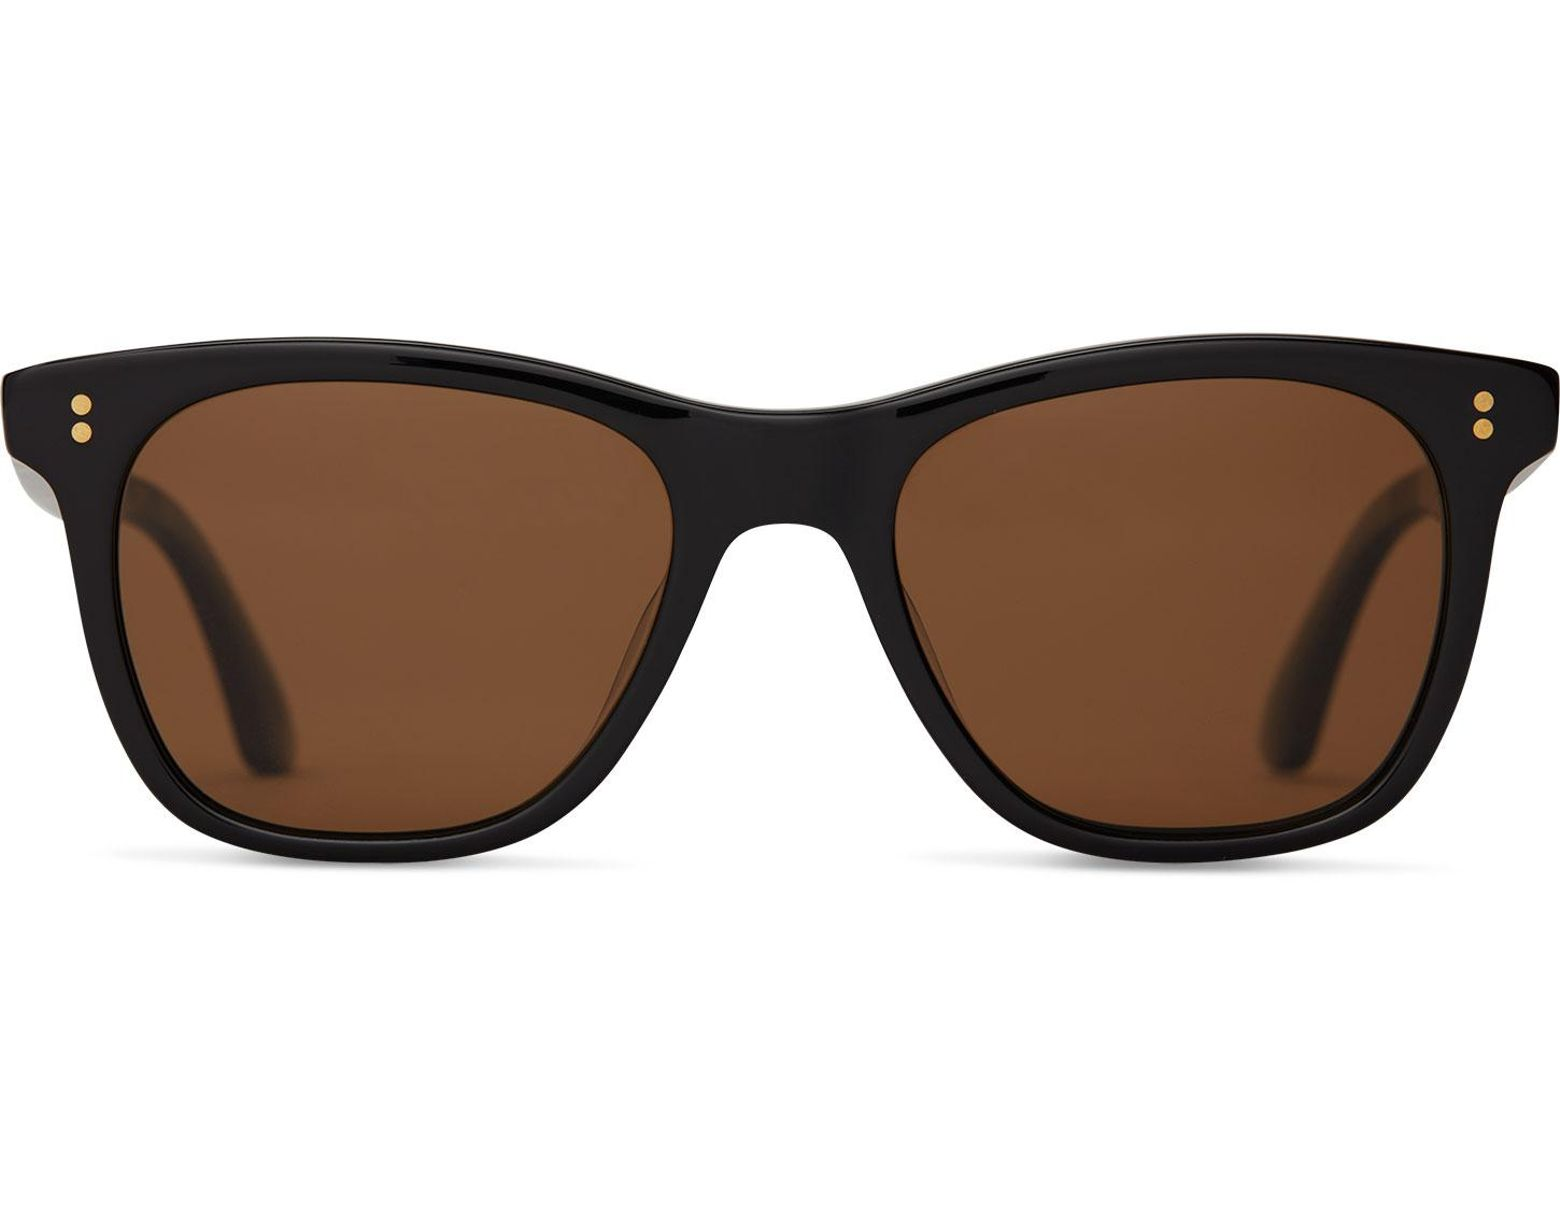 6eb2a38dc9d3 Lyst - TOMS Fitzpatrick Shiny Black Polarized in Black for Men